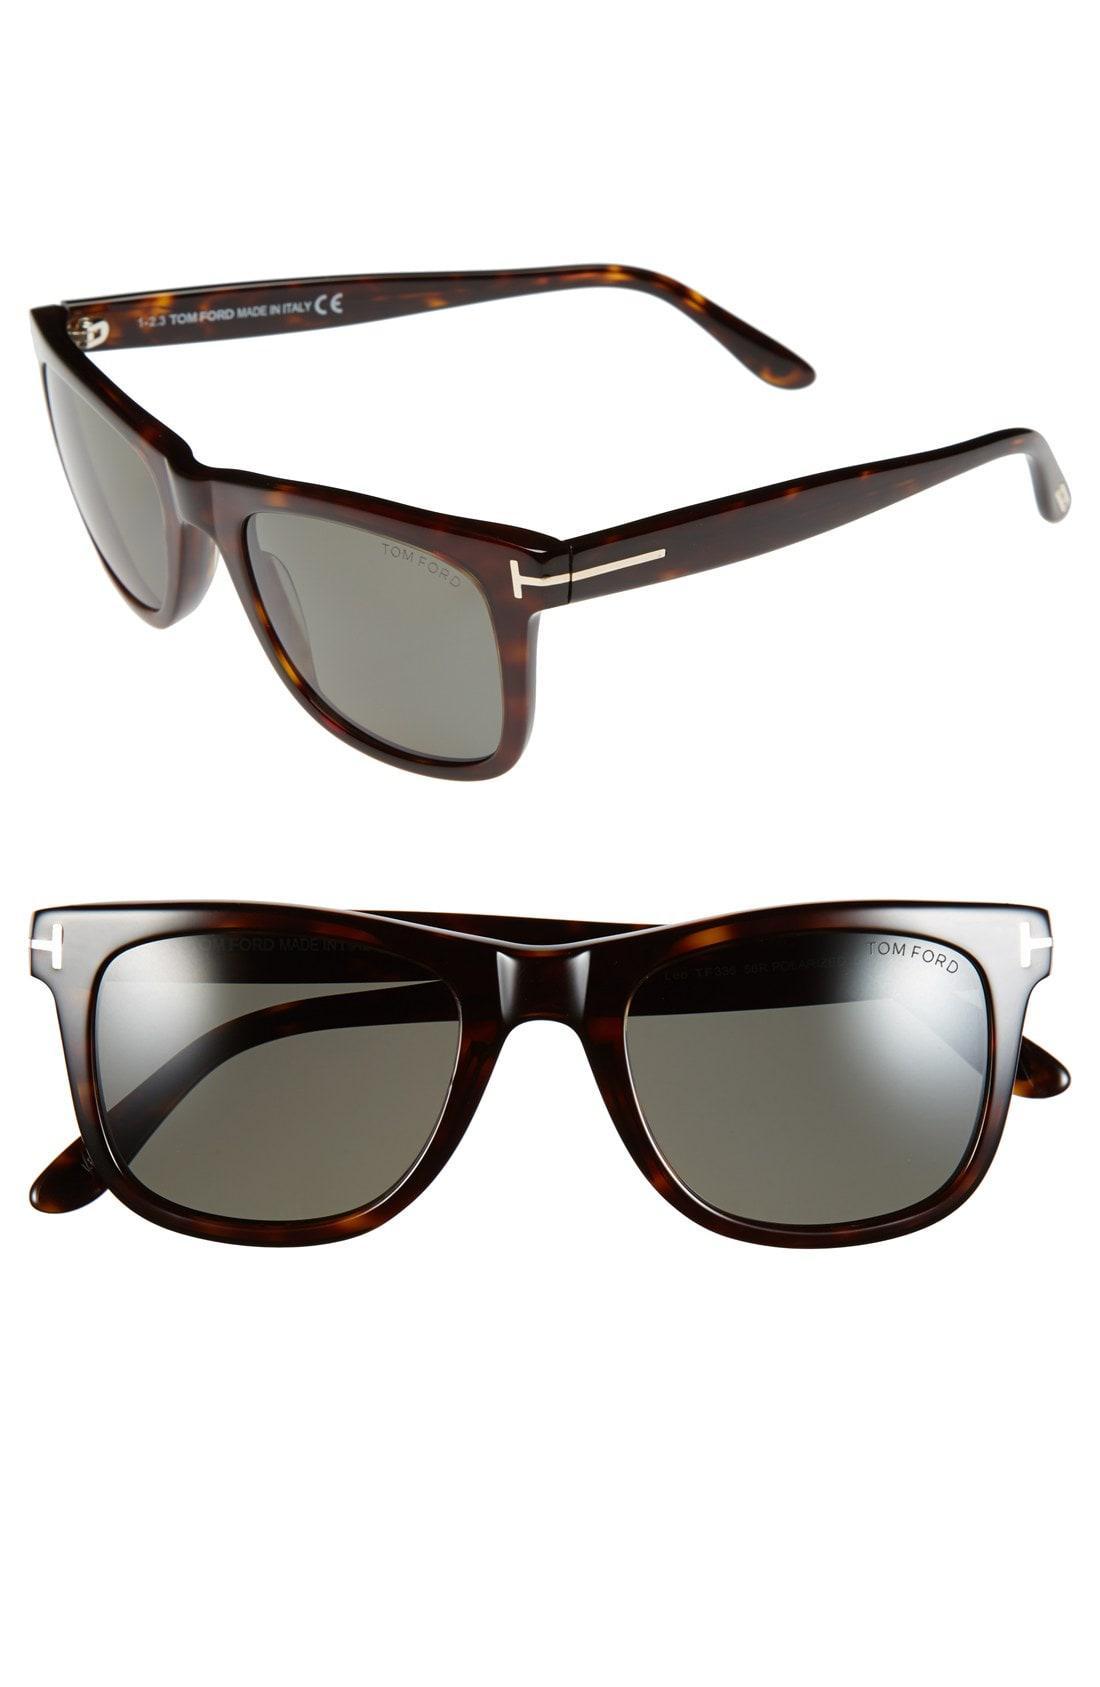 b96bf2a7f13 Tom Ford - Brown  leo  52mm Polarized Sunglasses - Shiny Classic Havana for  Men. View fullscreen